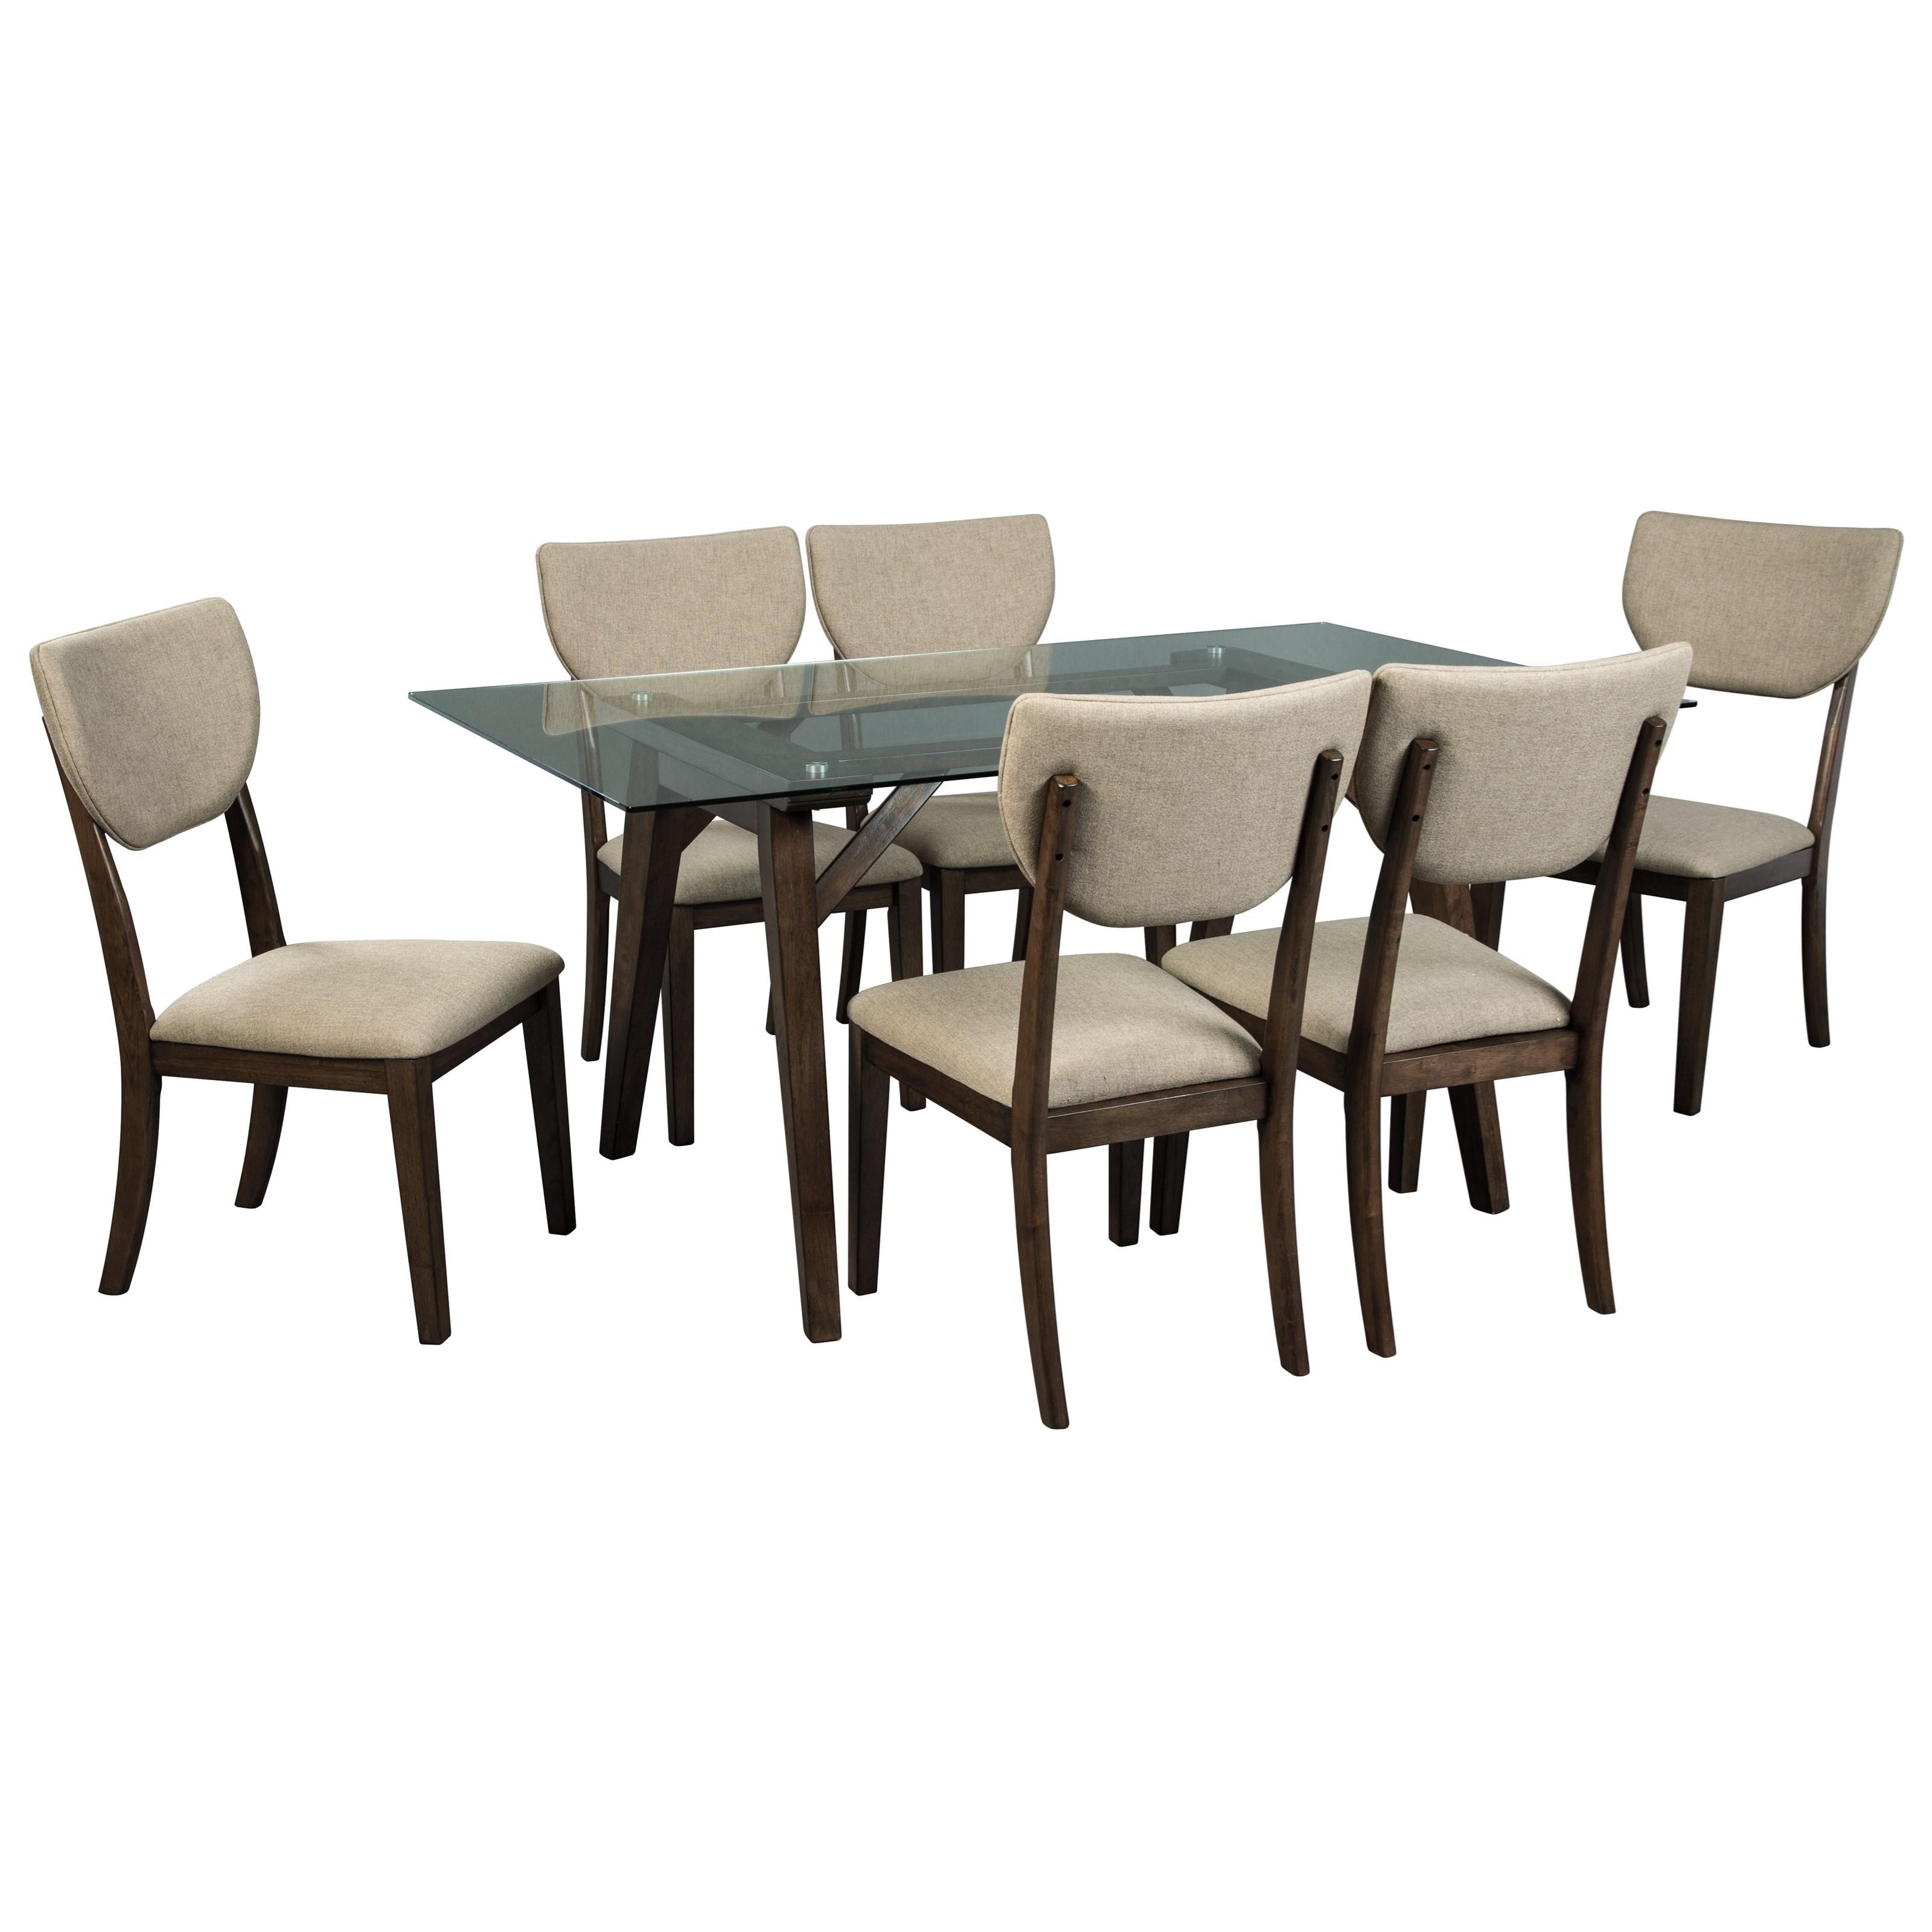 Signature Design by Ashley Joshton 7 Piece Rectangular Table Set - Item Number: D517-25+6x02